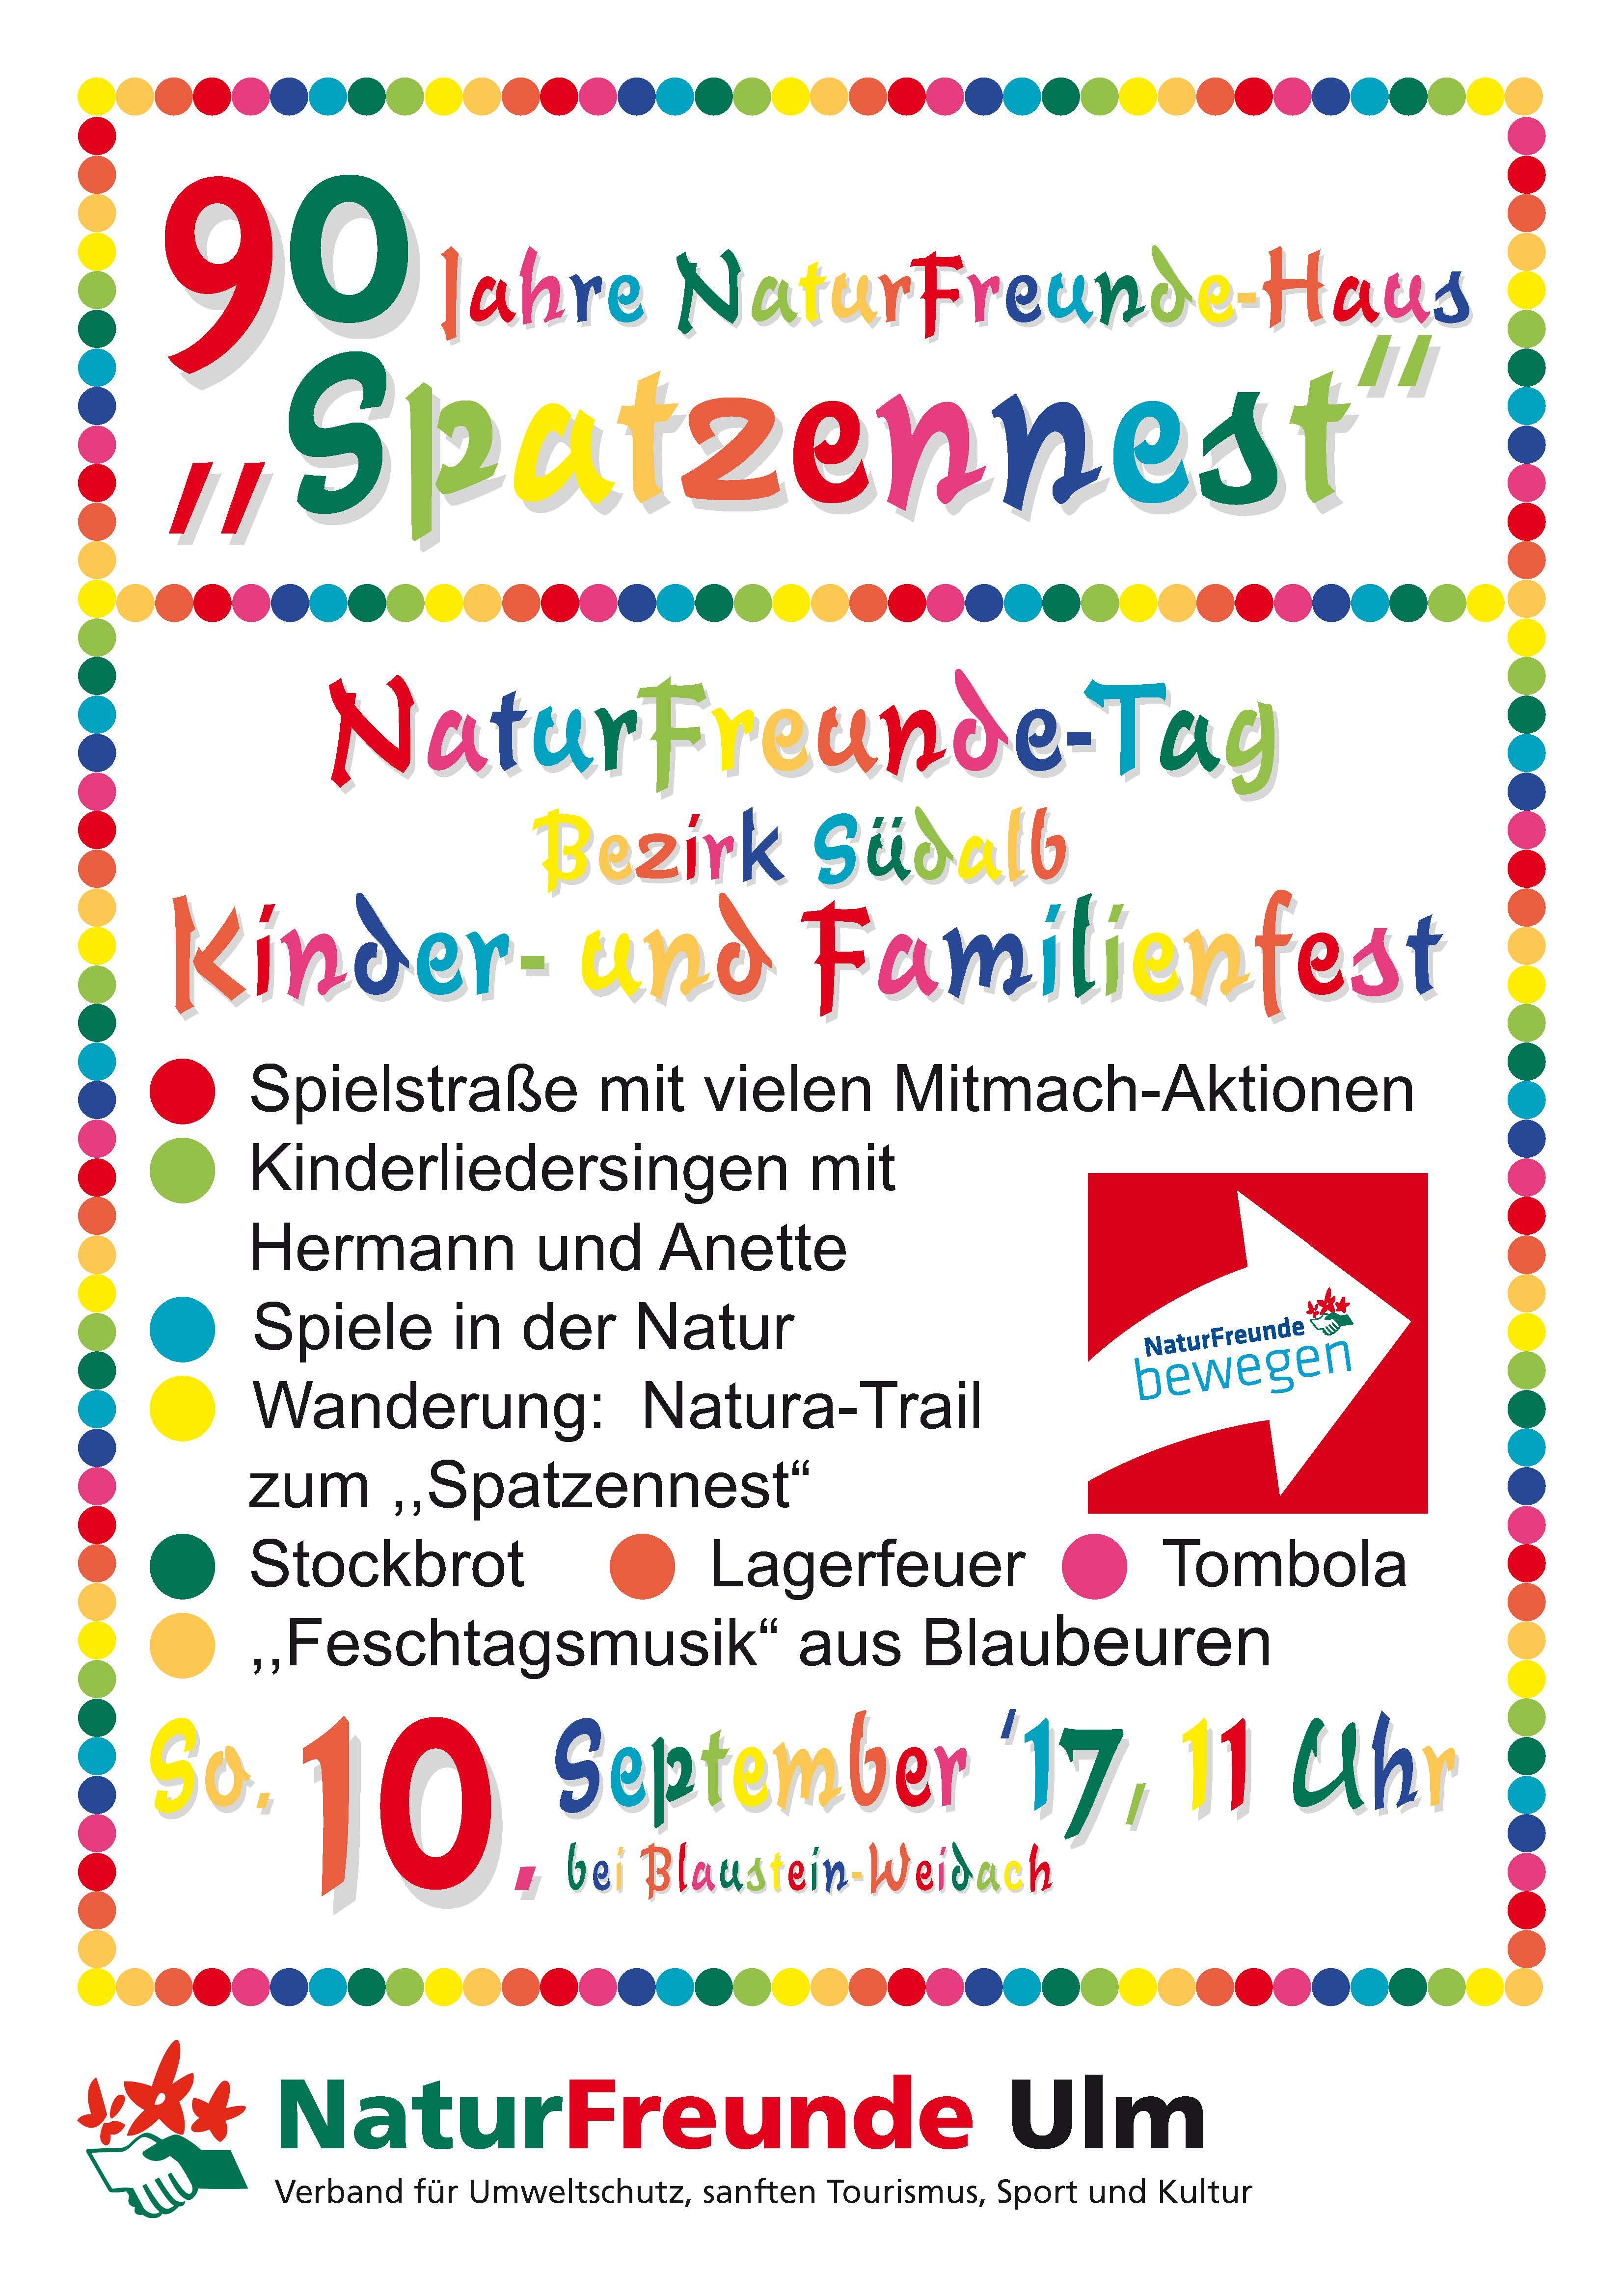 Flyer Kinderfest NF Tag 2017 Bezirk A4.jpg